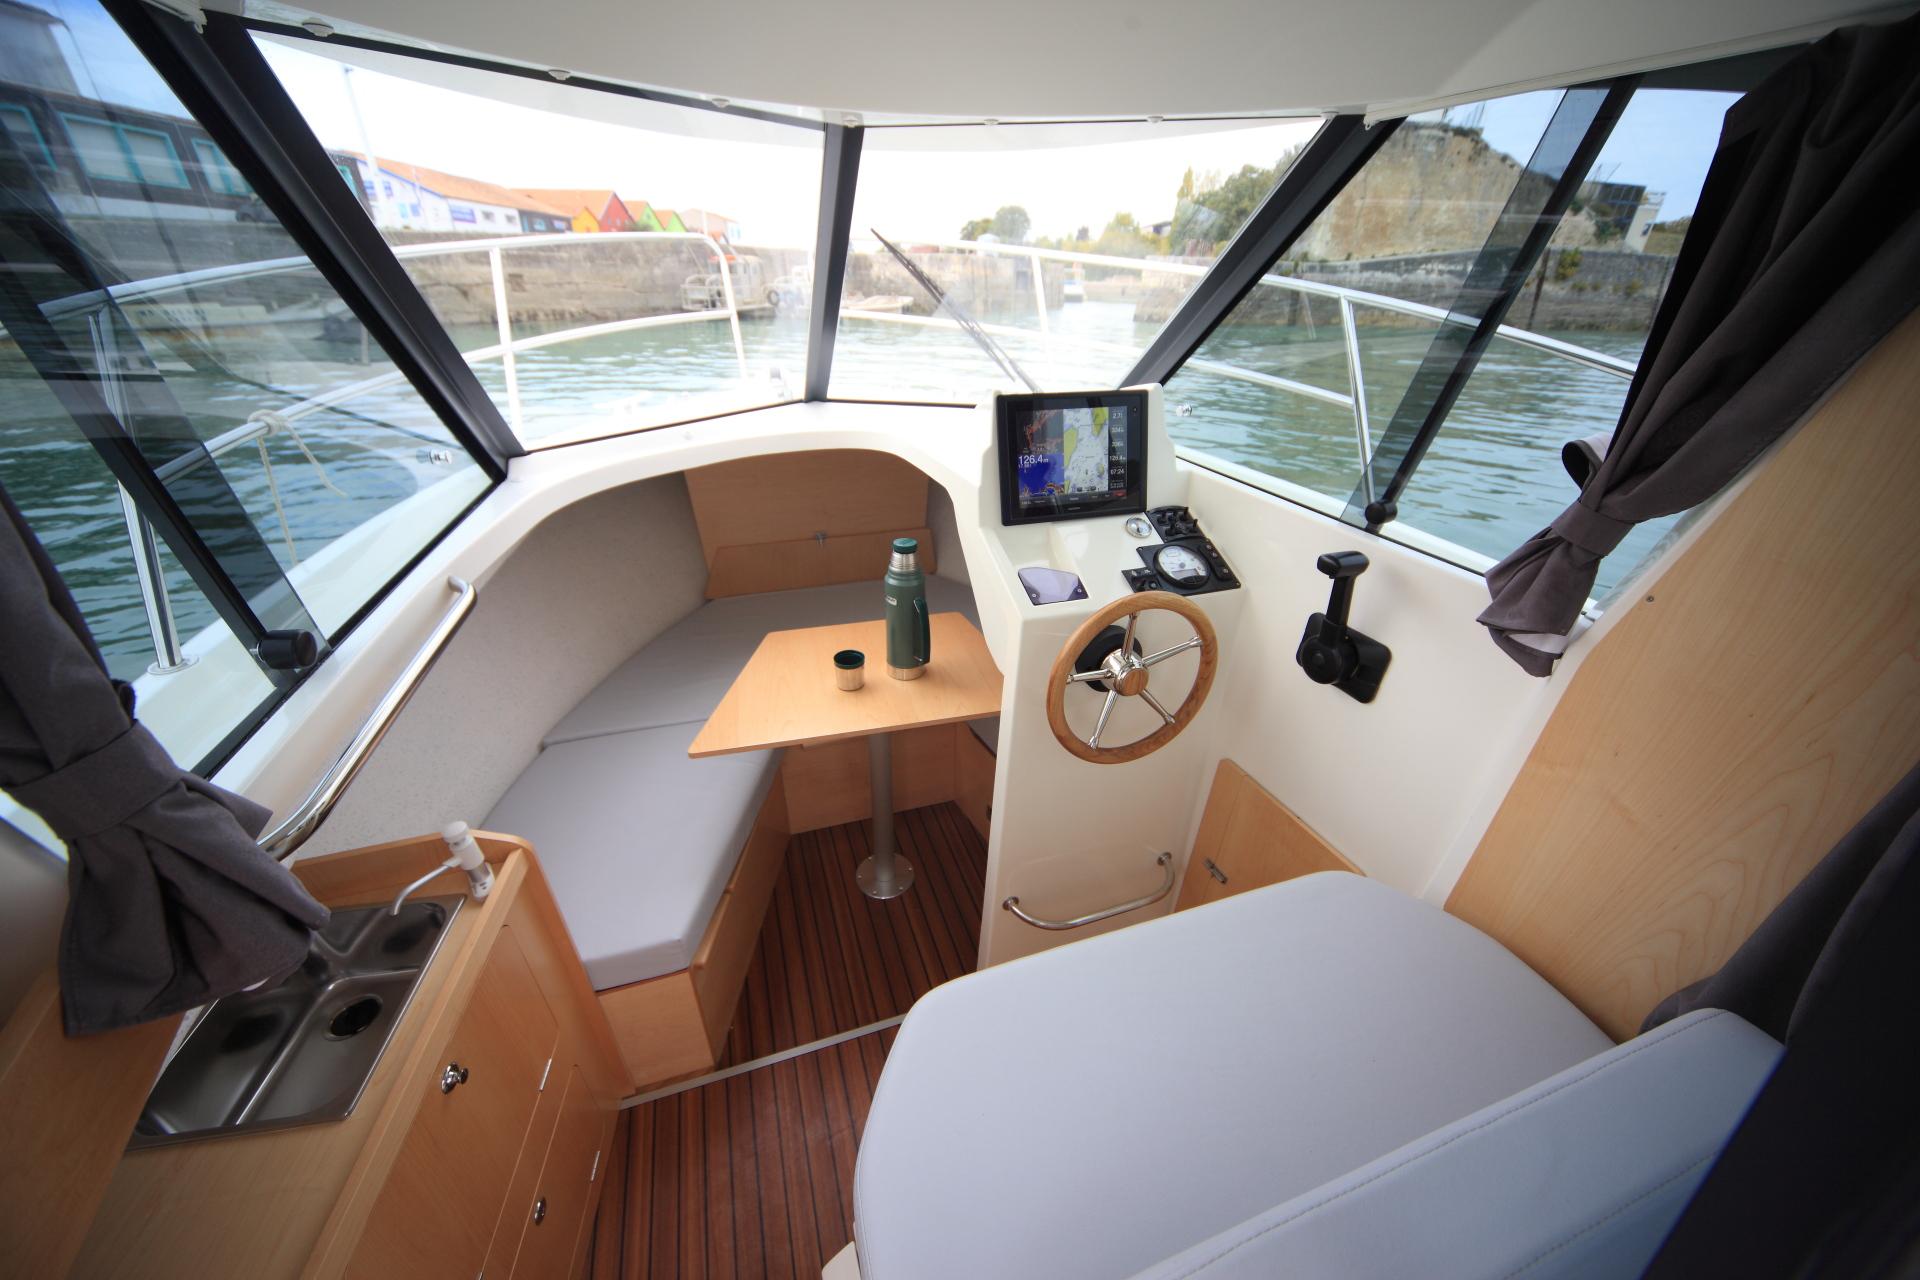 Motorboat Ocqueteau Timonier 625 Inboard Pilothouse Our